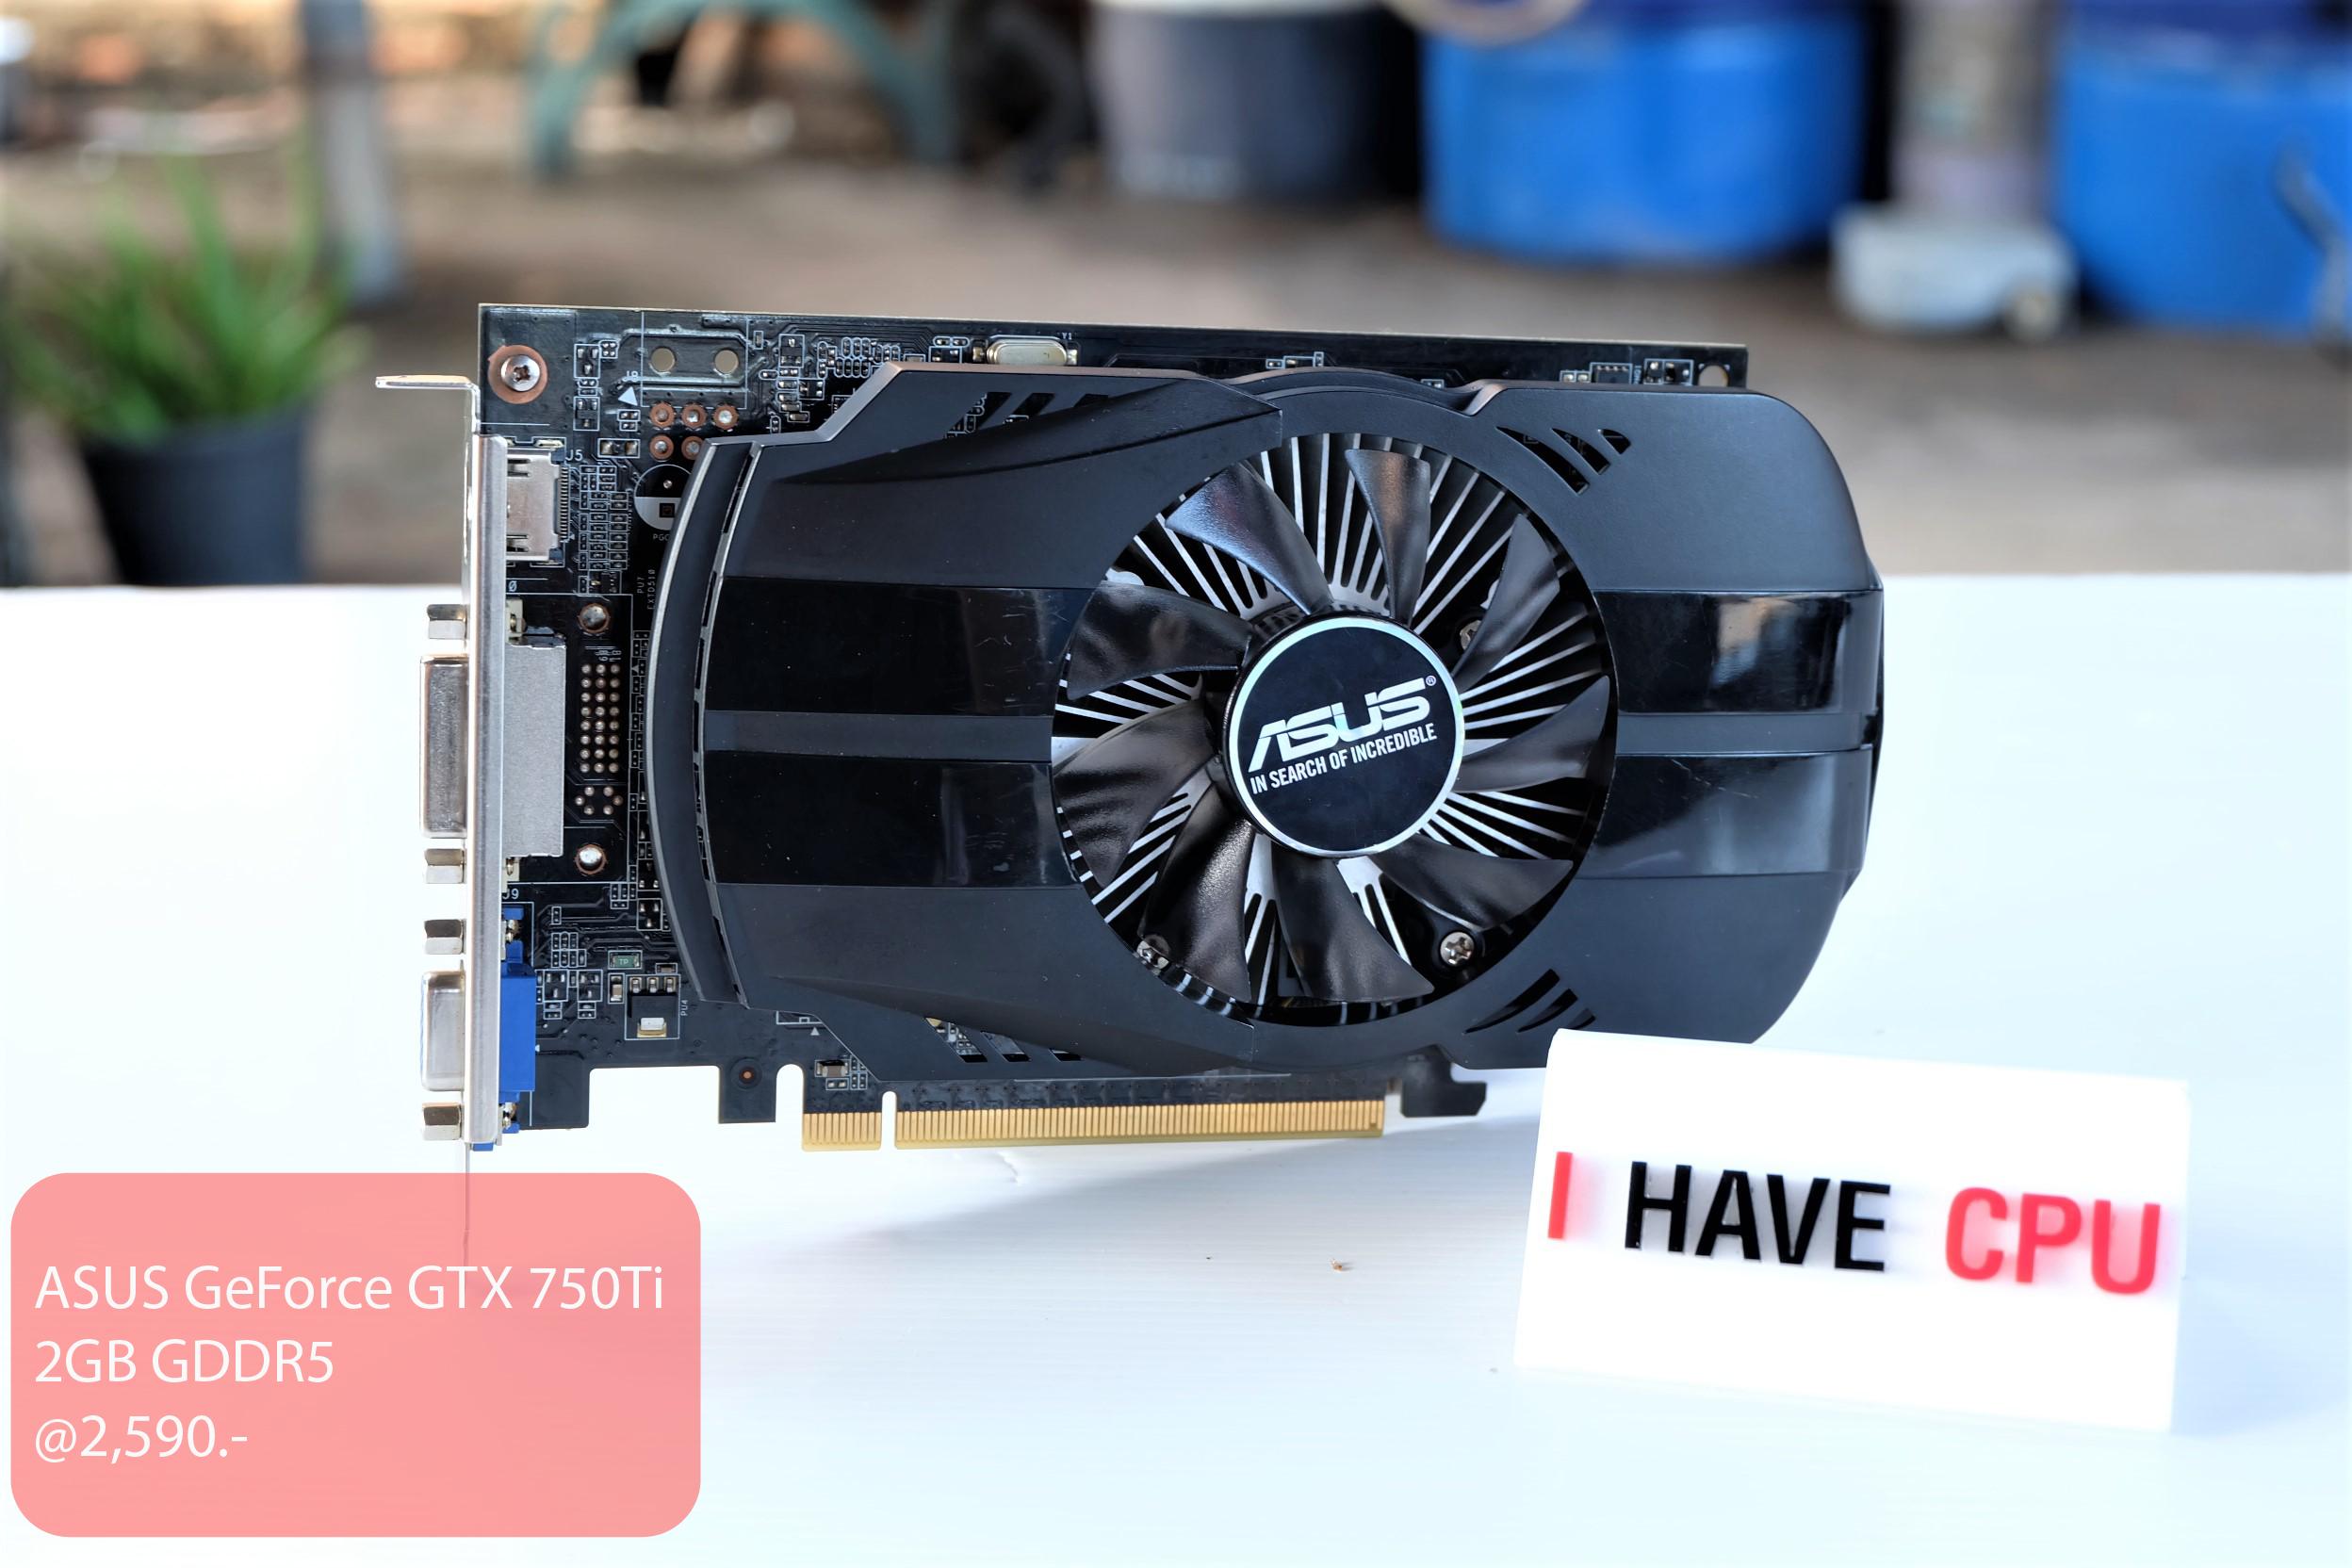 ASUS NVIDIA GeForce GTX 750Ti 2GB GDDR5 ไม่ต่อไฟเลี้ยง